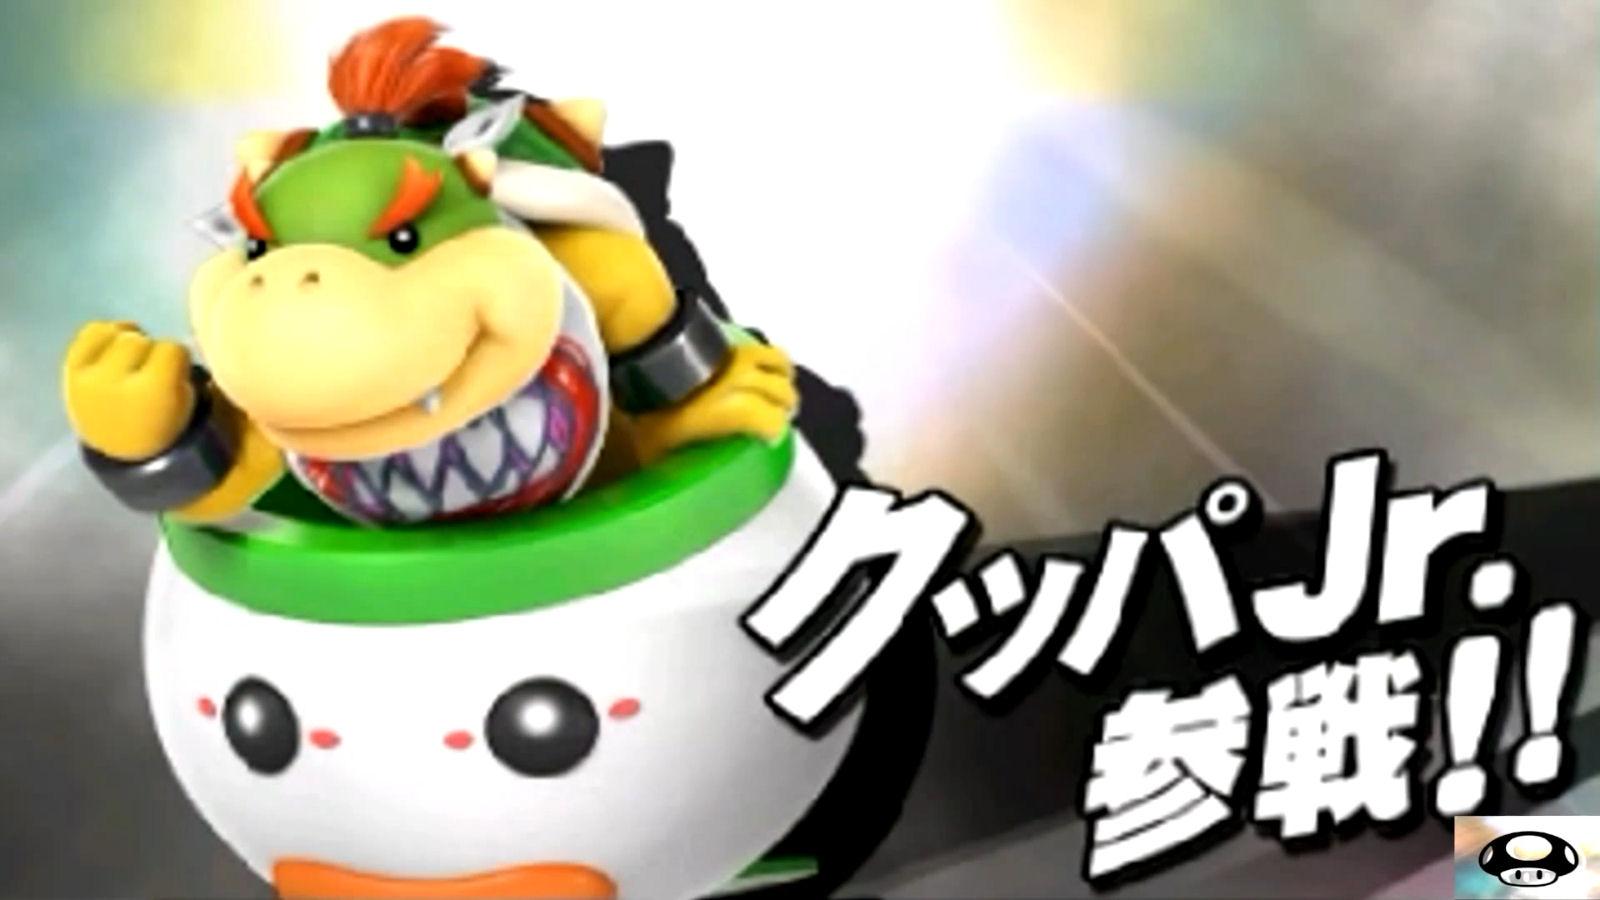 Super Smash Bros 3DS How To Unlock Bowser Jr